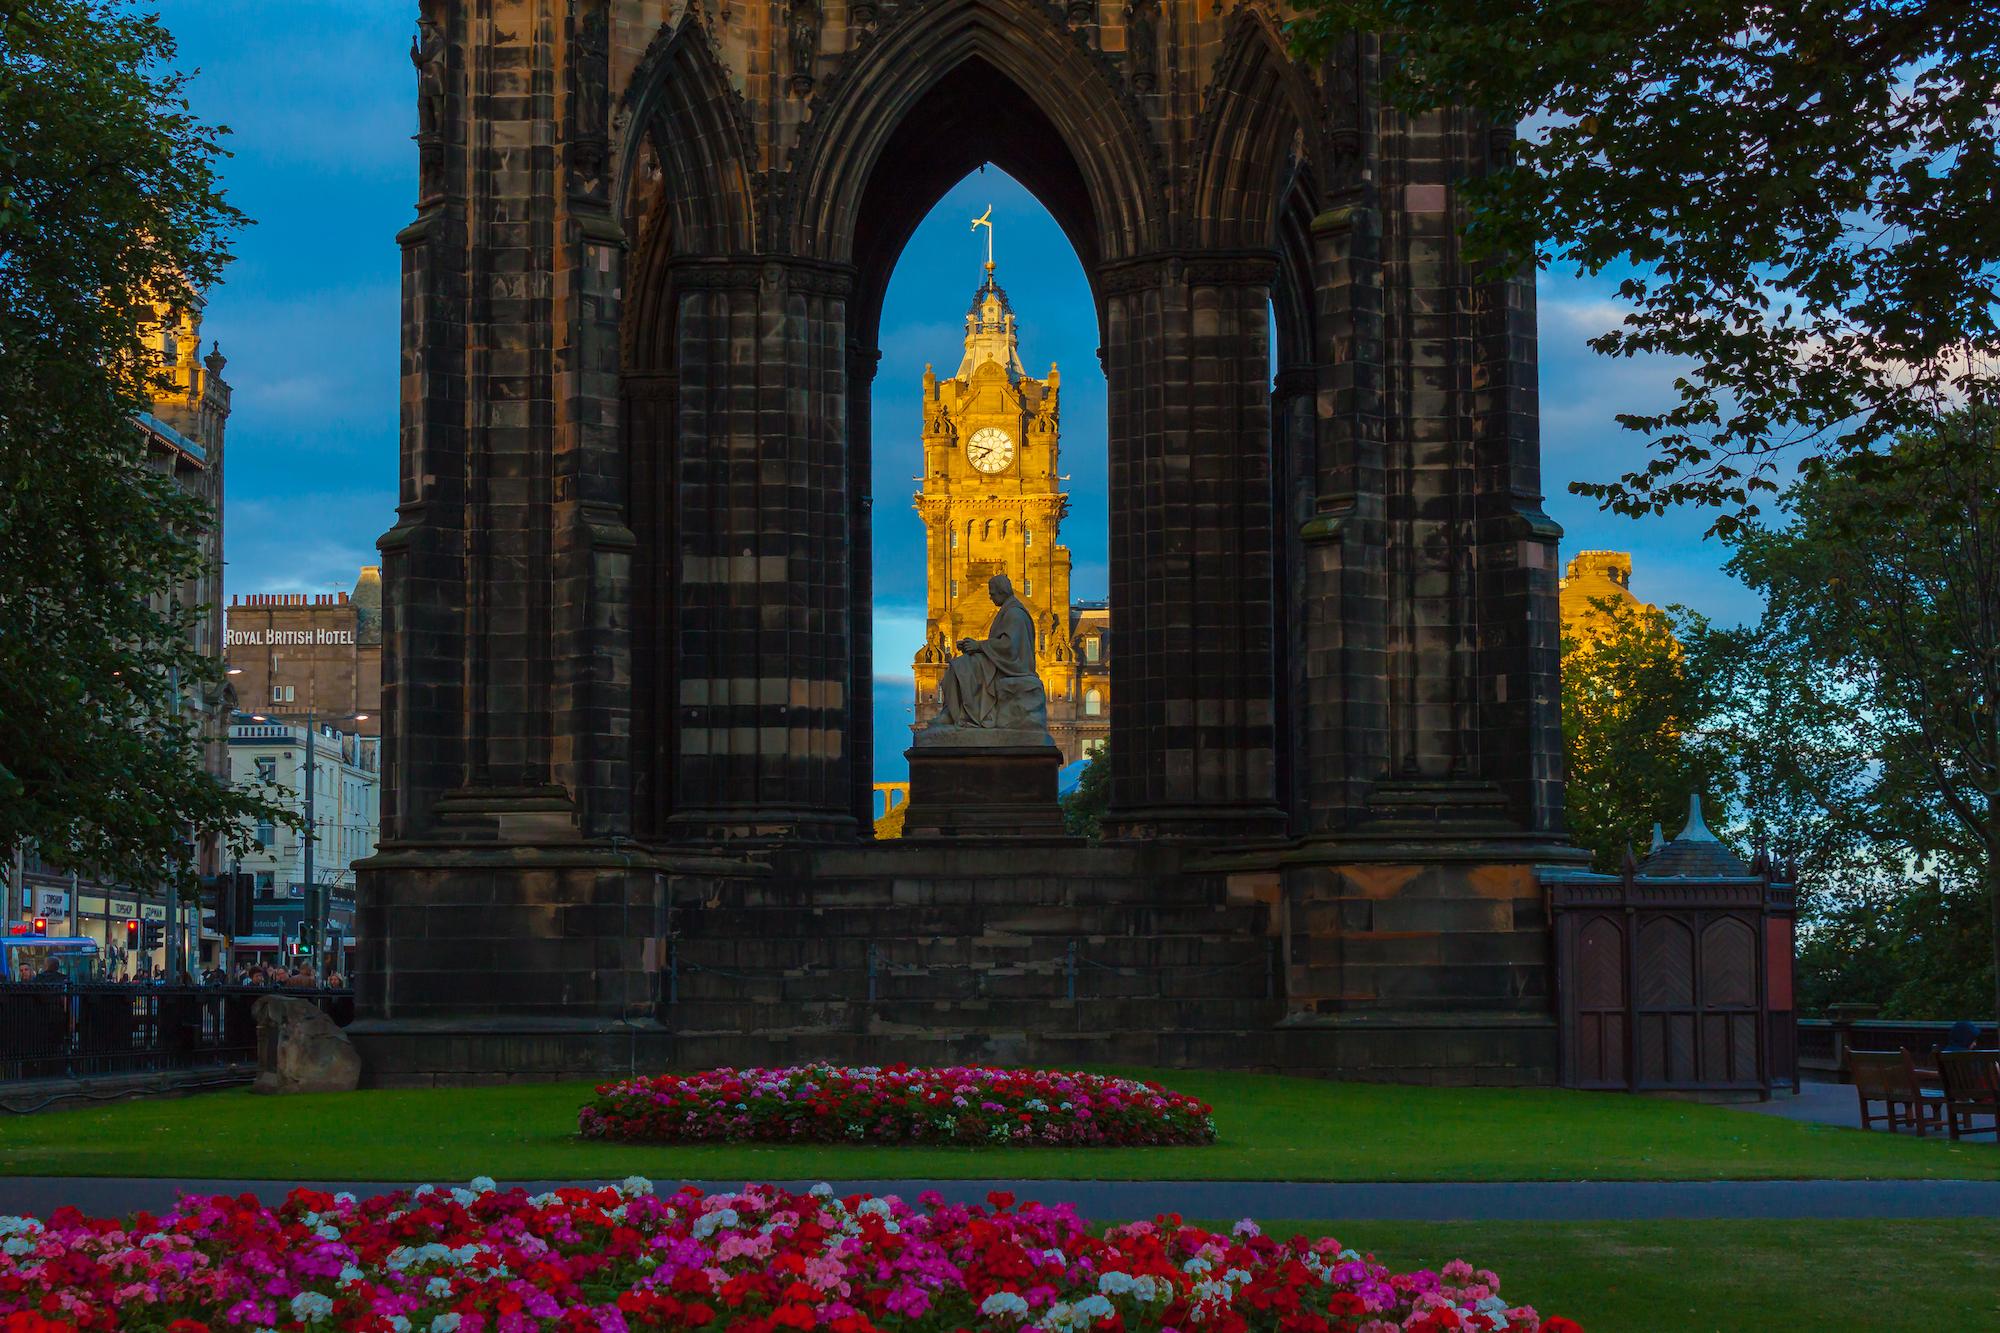 (12) Sir Walter Scott Monument and Balmoral Hotel Clock Tower, Princes Street, Edinburgh, Scotland. Copyright David Wheater.jpg